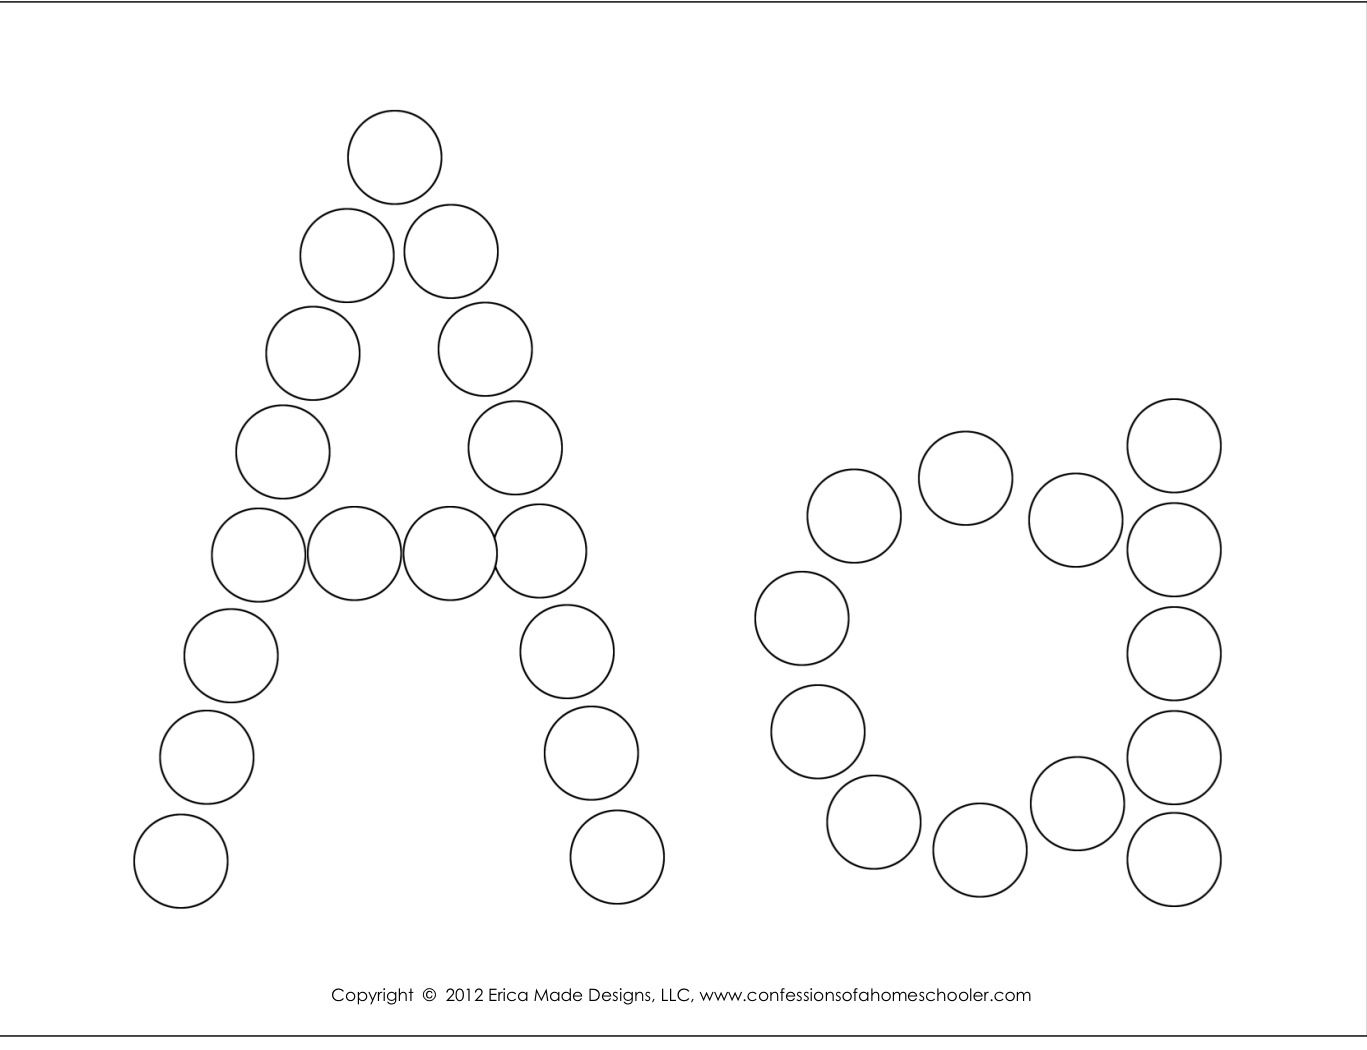 Pin by T Cintron on Homeschooling (Christian) | Preschool worksheets ...